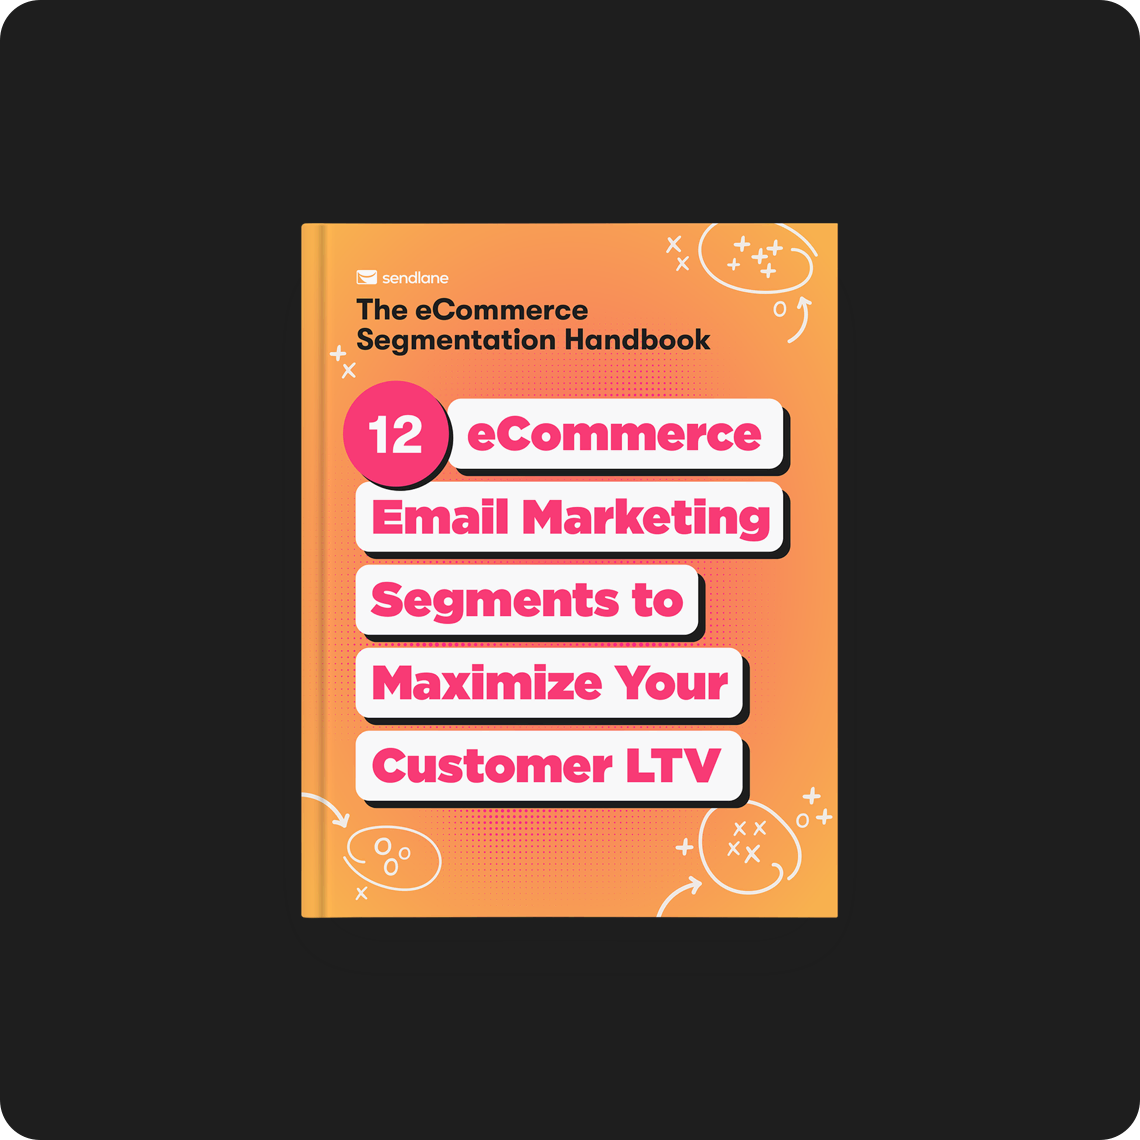 The eCommerce Segmentation Handbook